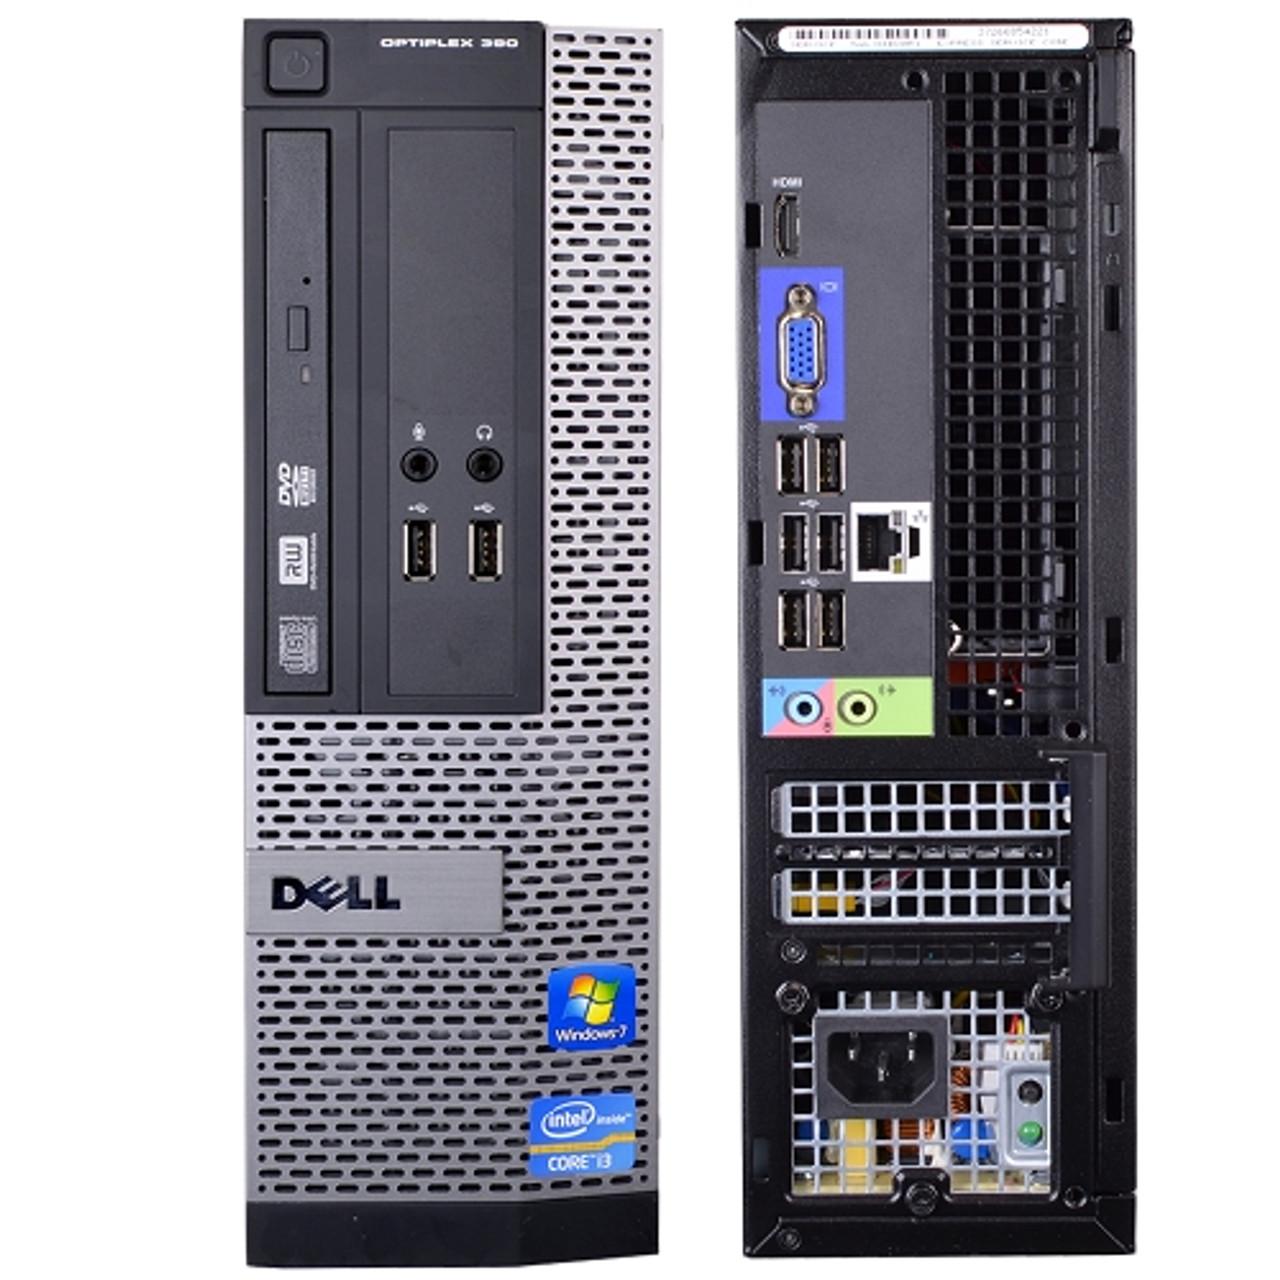 Dell Optiplex 390 SFF Core i3 3.1GHz, 4GB Ram, 250GB HDD, DVD-RW, Windows 7 Pro 64 Desktop Computer